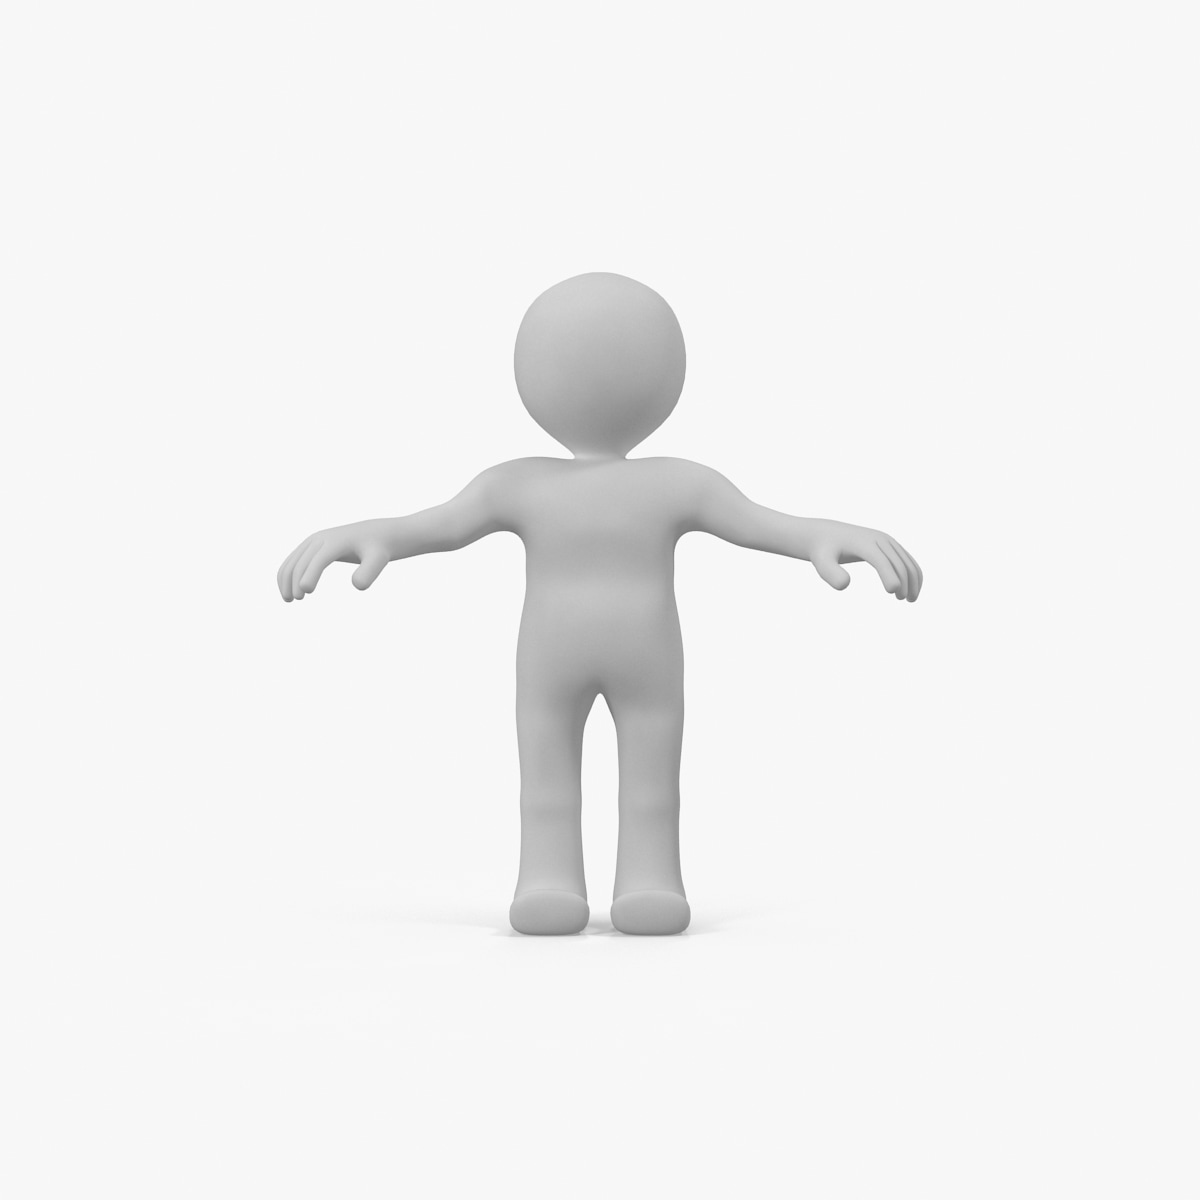 3d model rigged stickman cartoon character